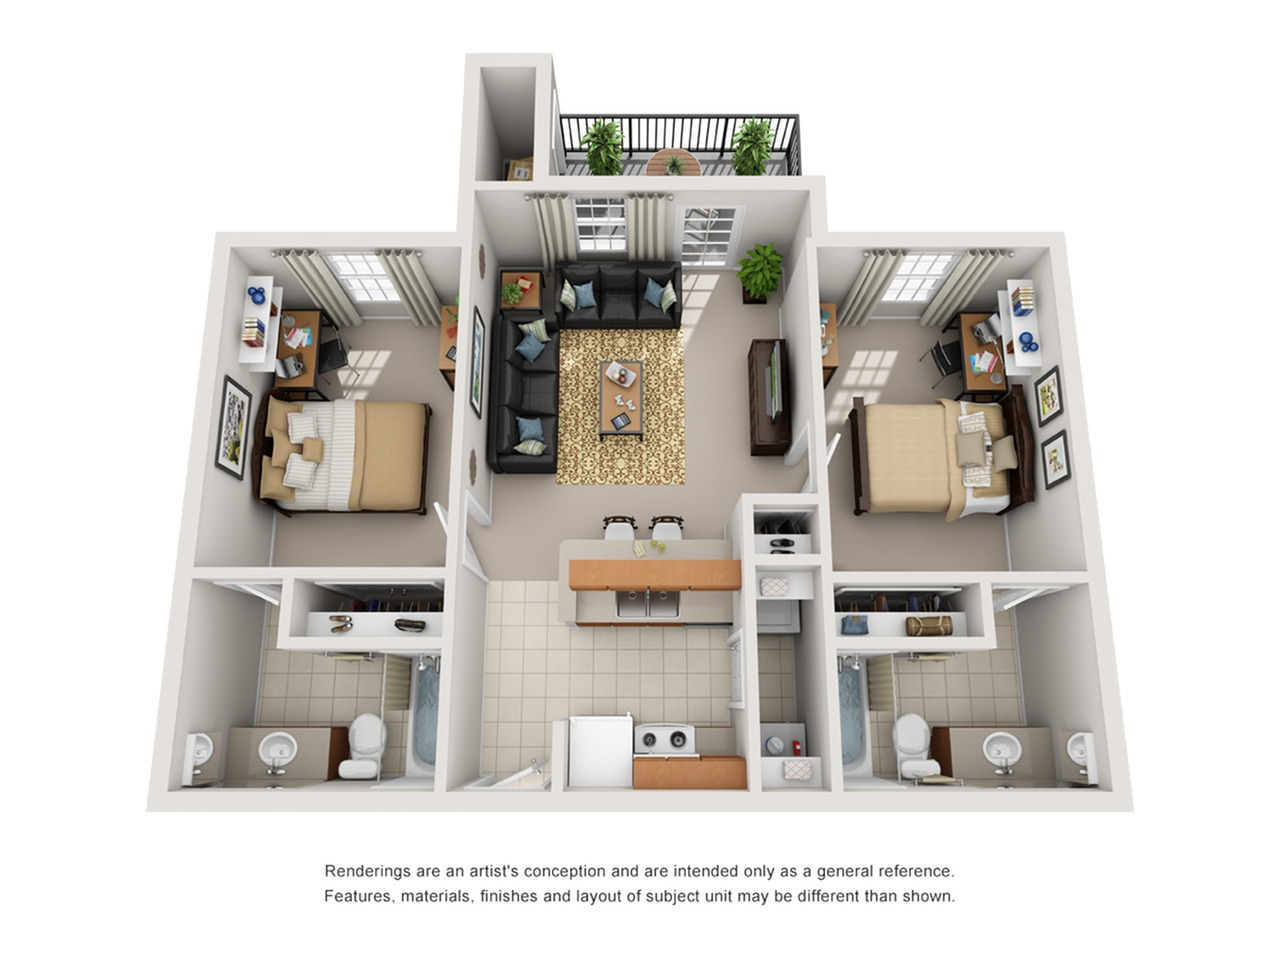 2 bedroom apartments in tucson